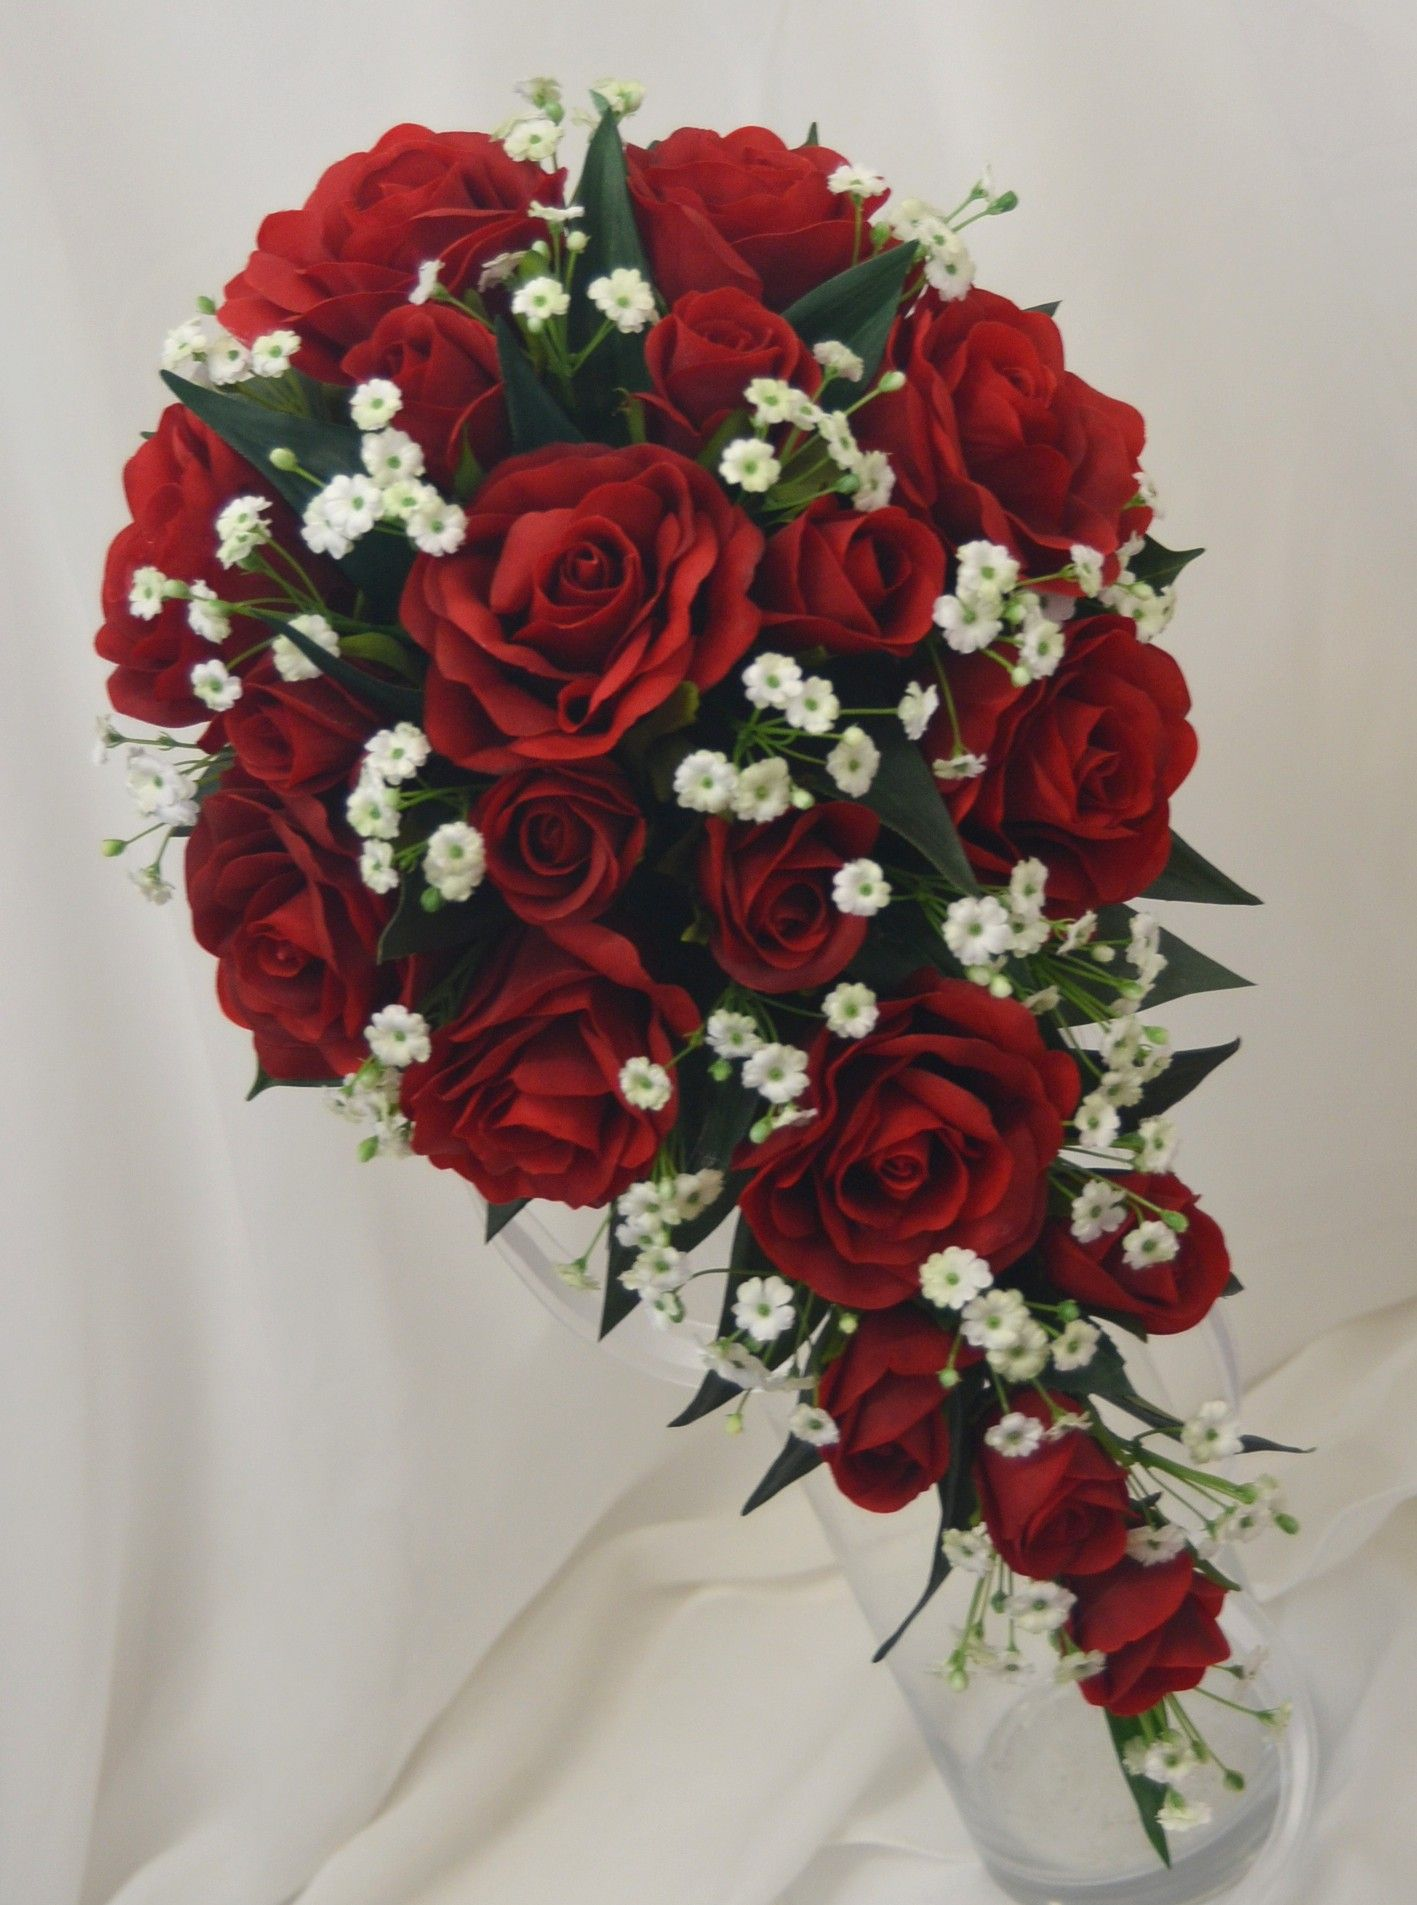 Red roses babies breath white diamante garden style teardrop bouquet ...